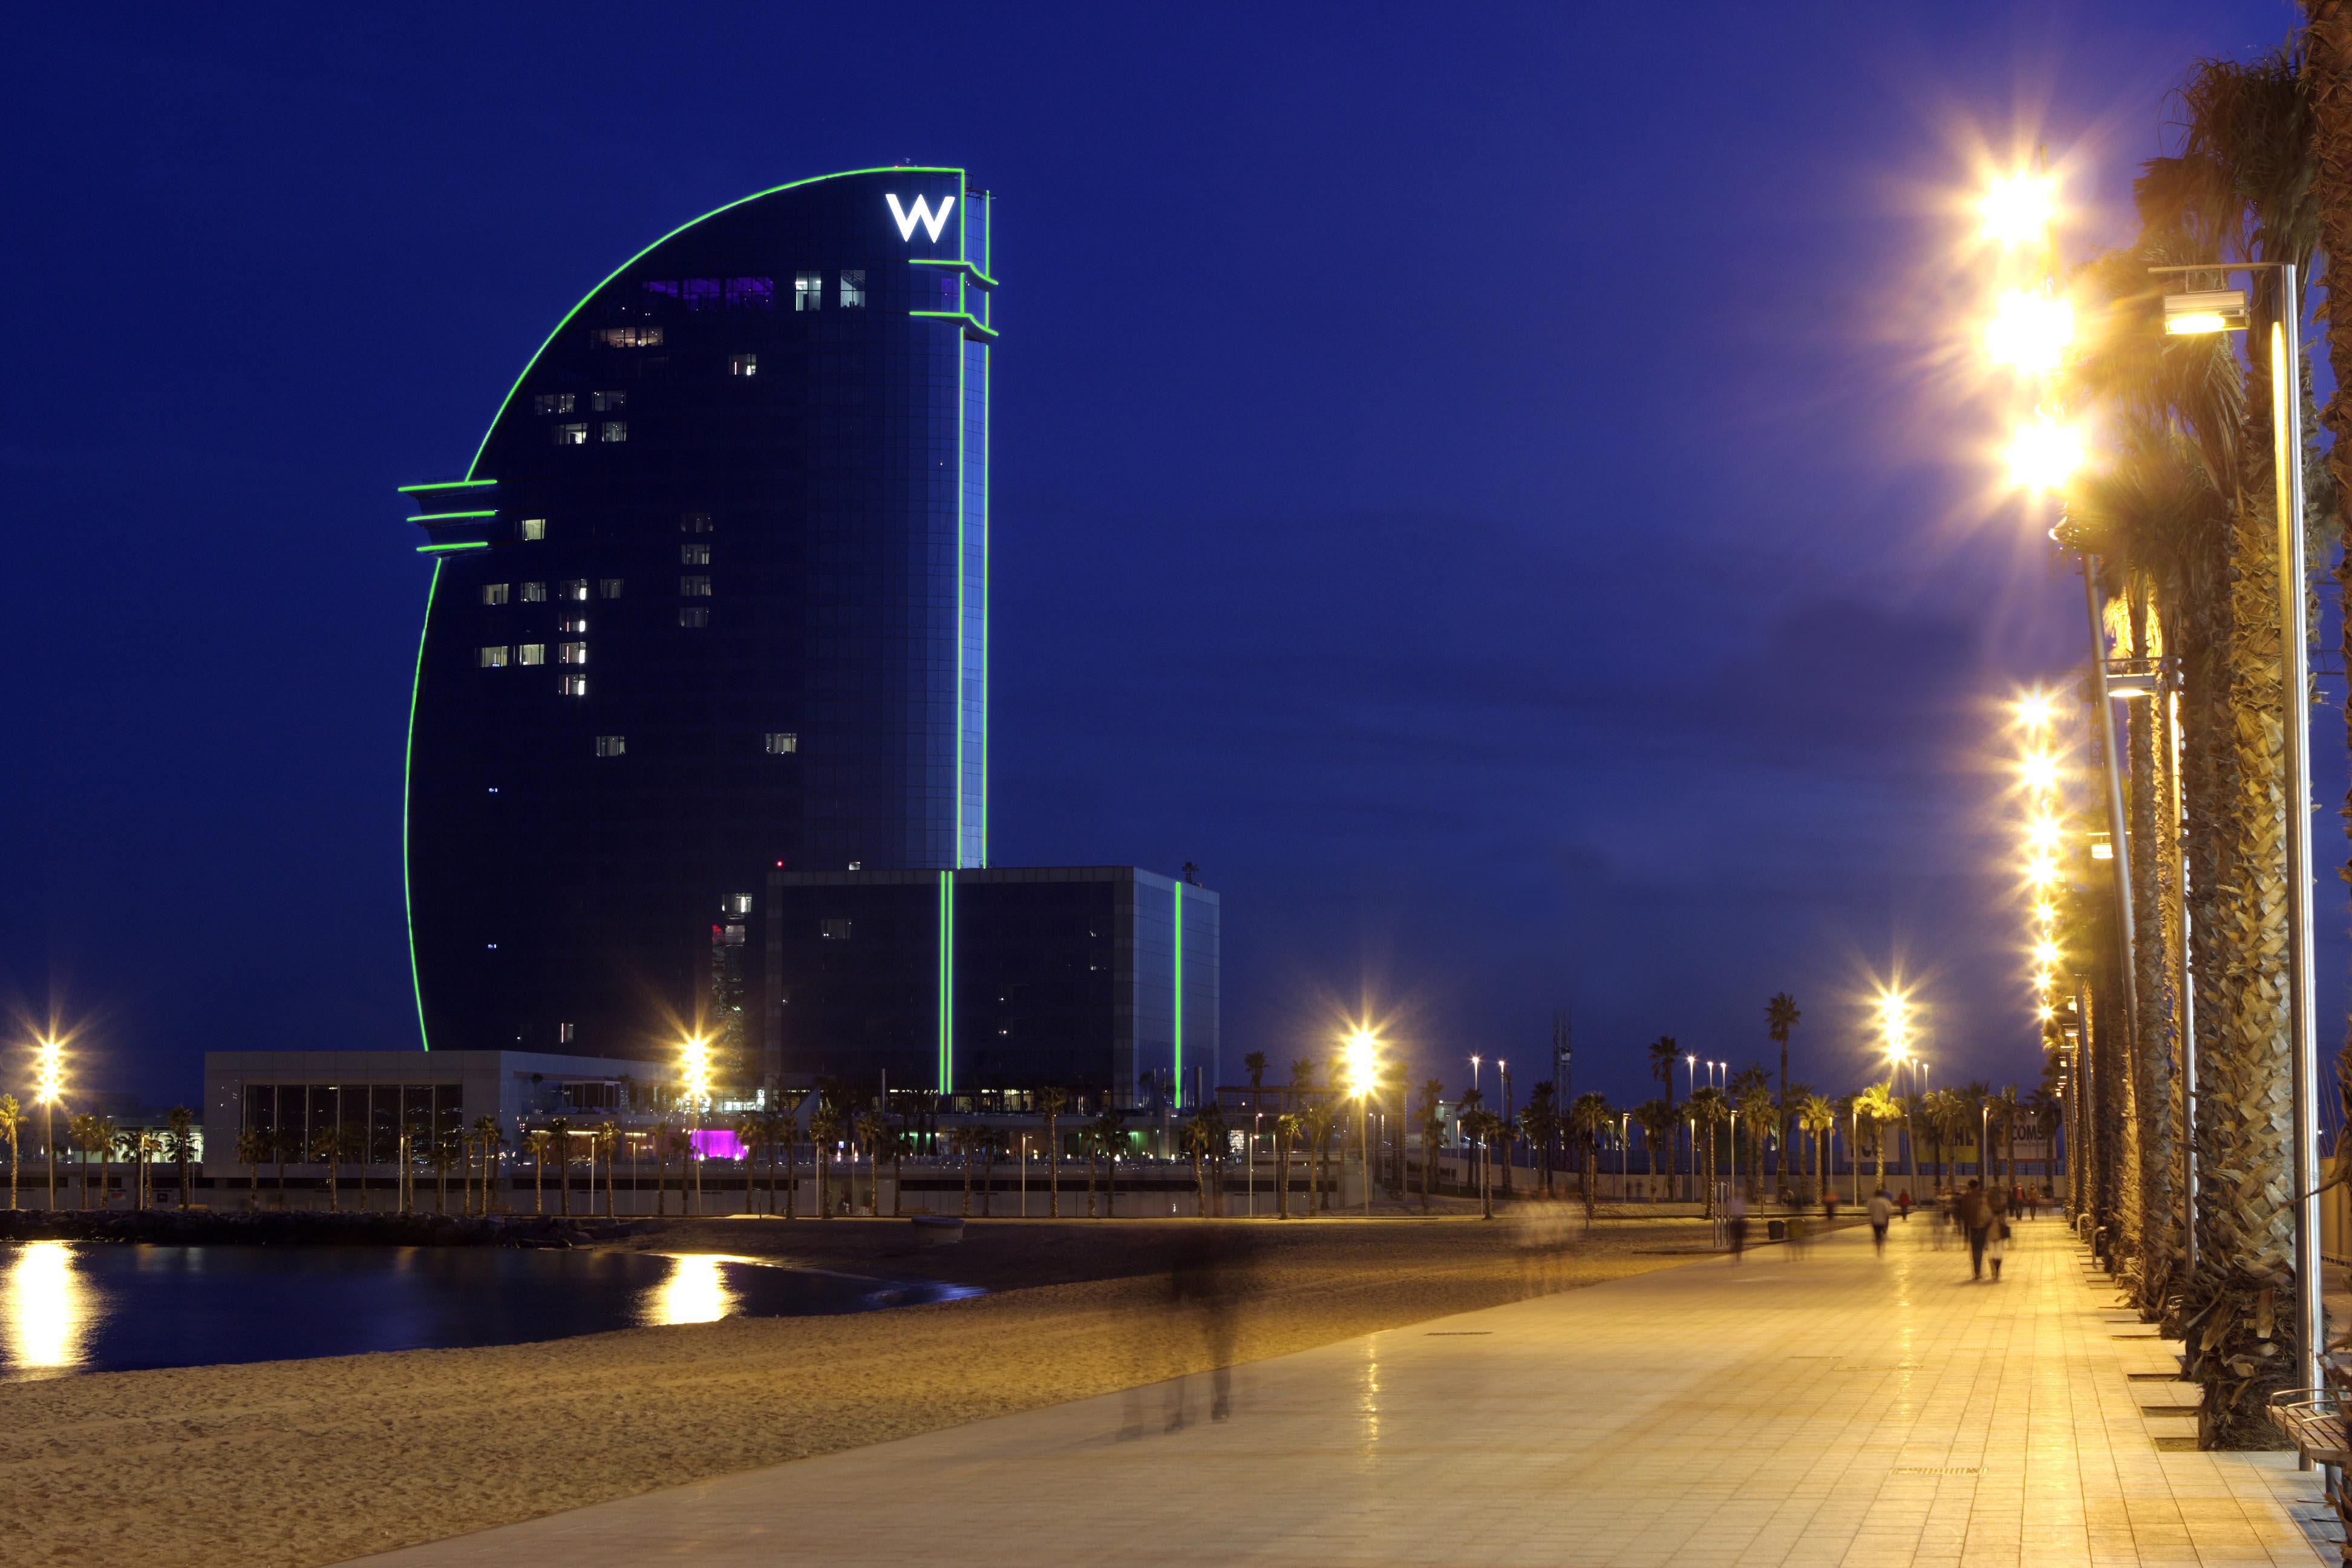 Hotel W Barcelona tira verde